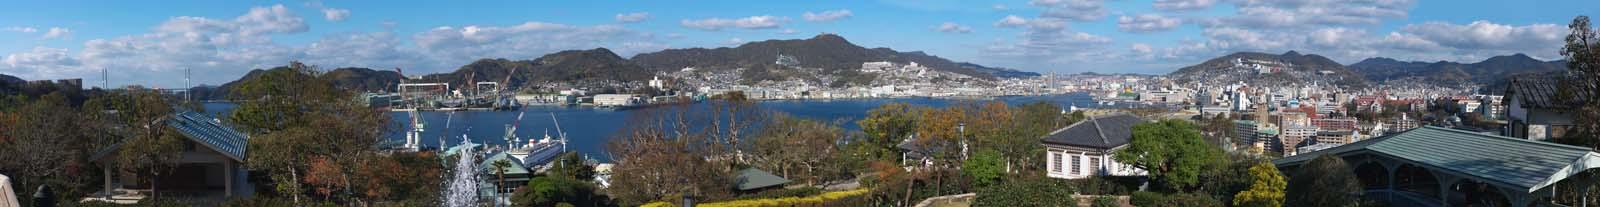 photo,material,free,landscape,picture,stock photo,Creative Commons,Nagasaki Port whole view, Nagasaki Port, crane, building, bridge